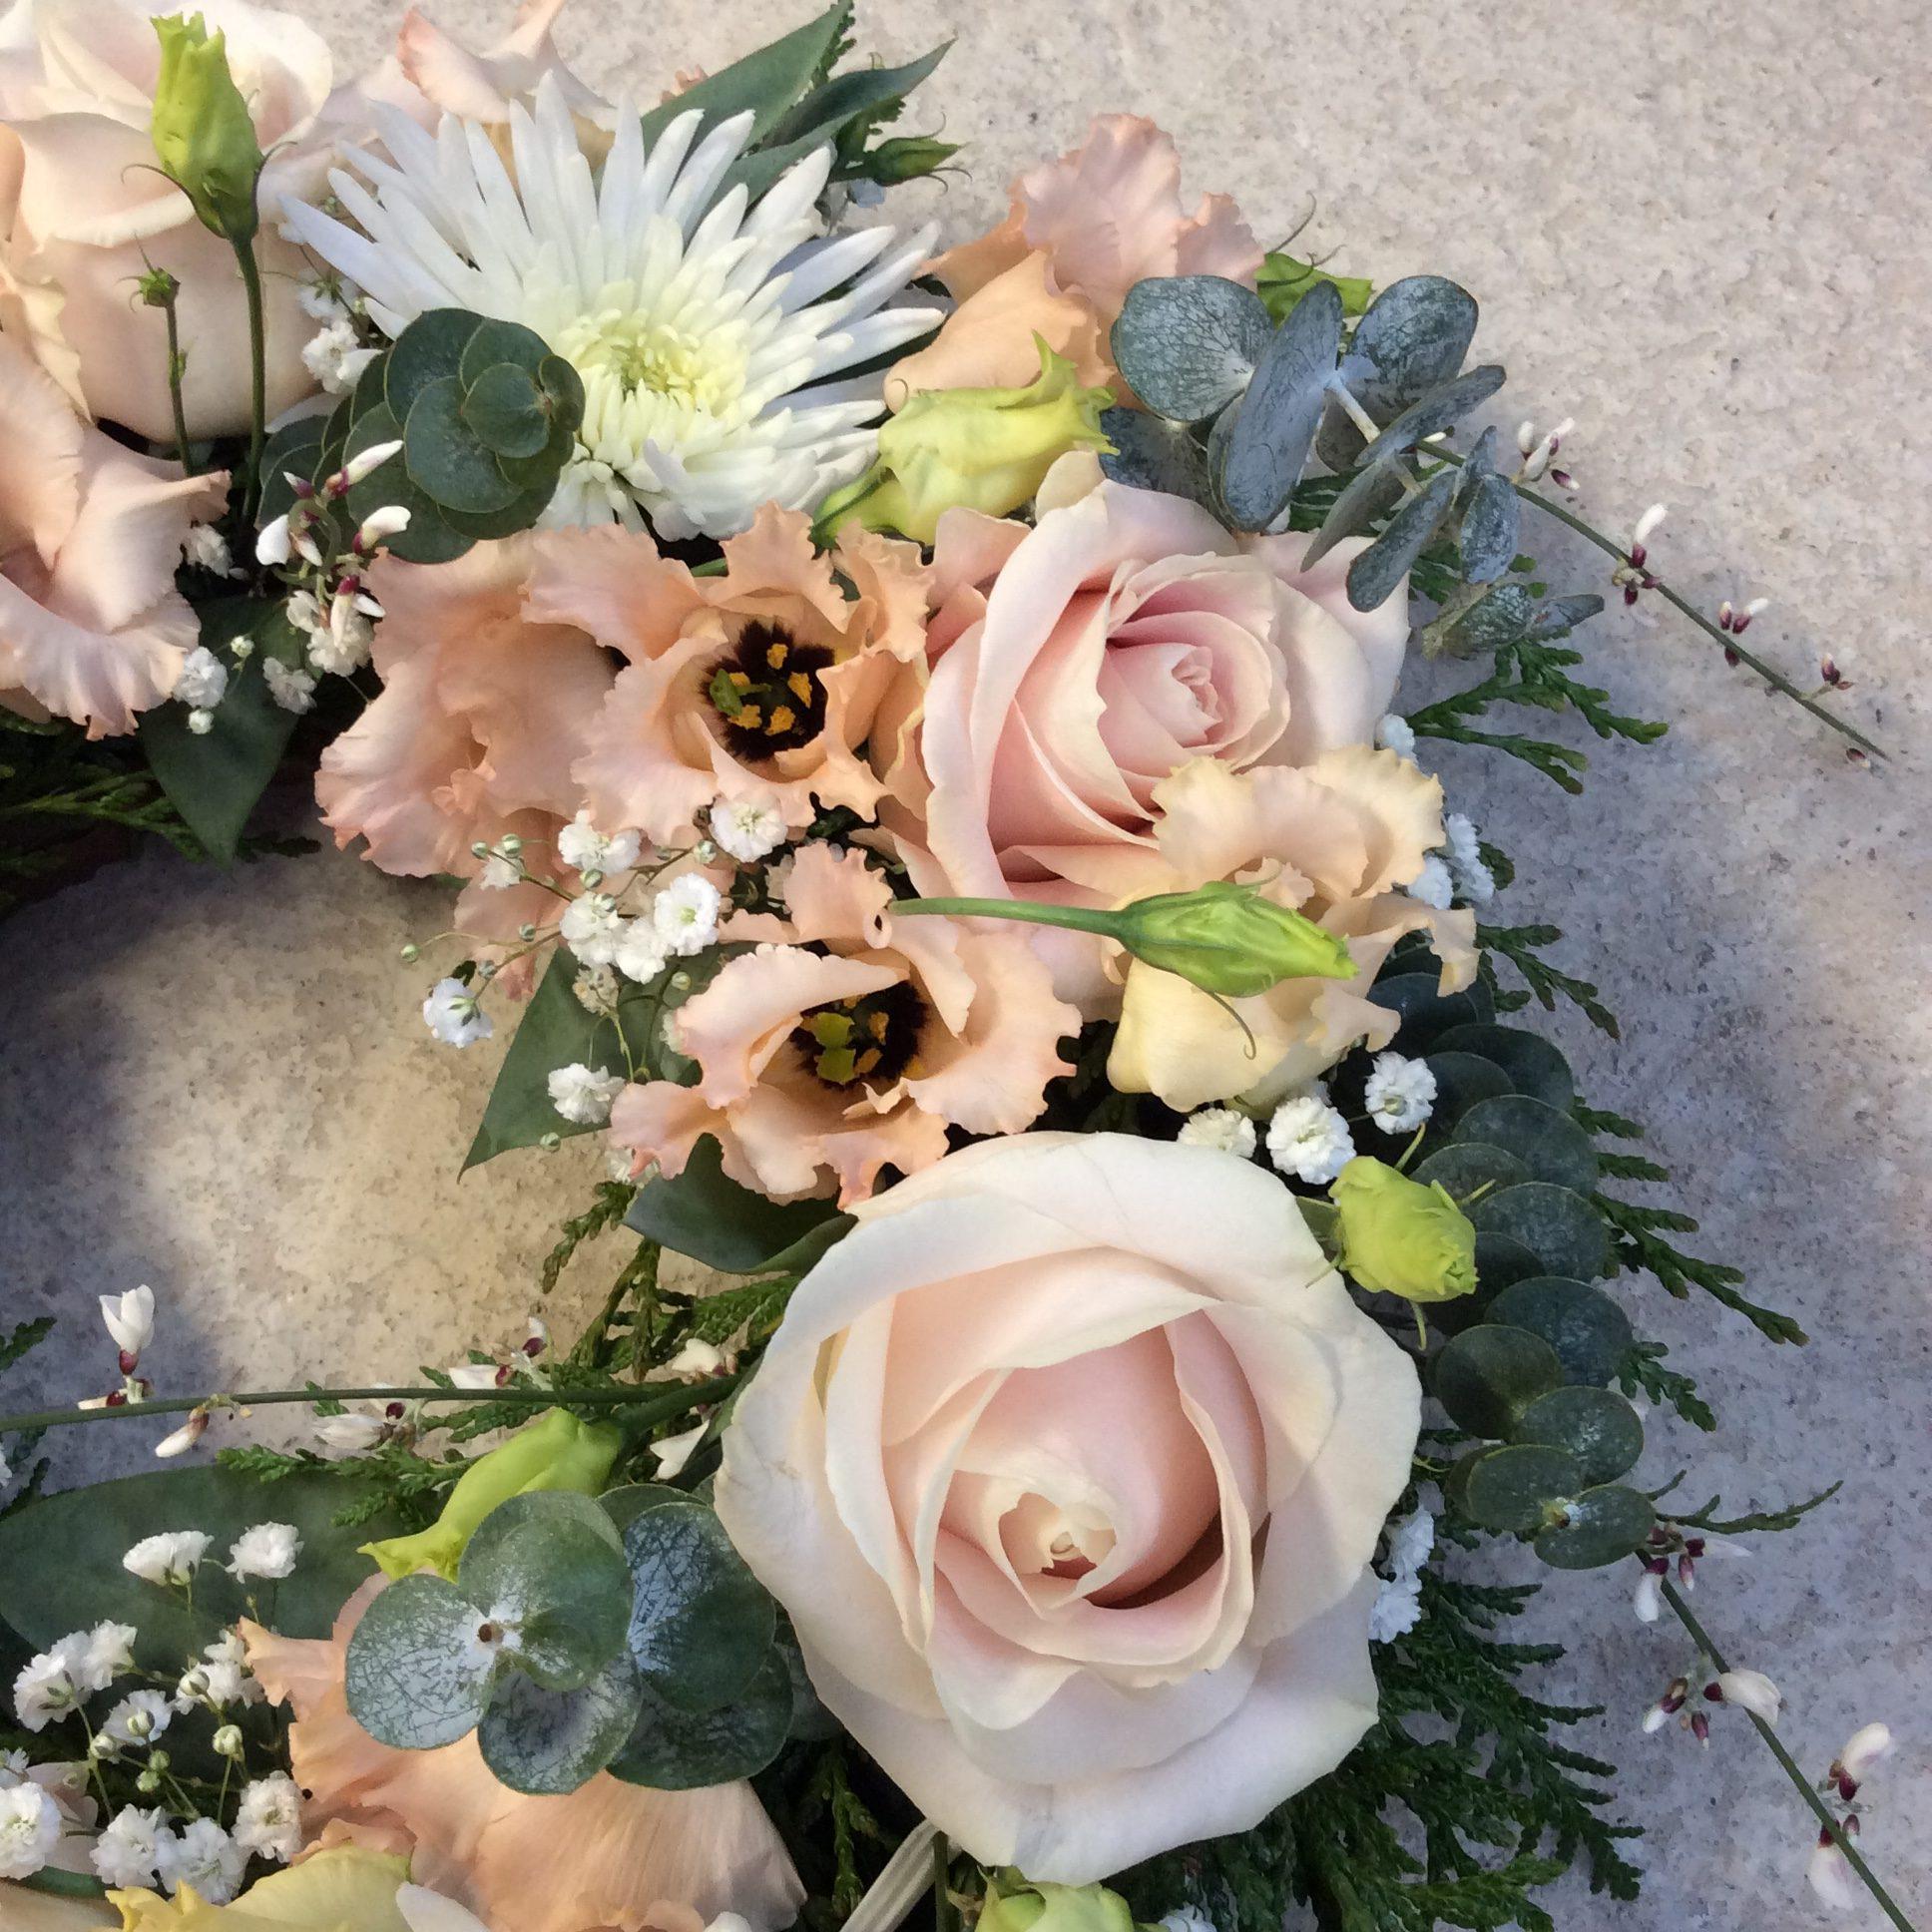 gerbe de fleurs rose et blanc fleuriste woippy effleurs